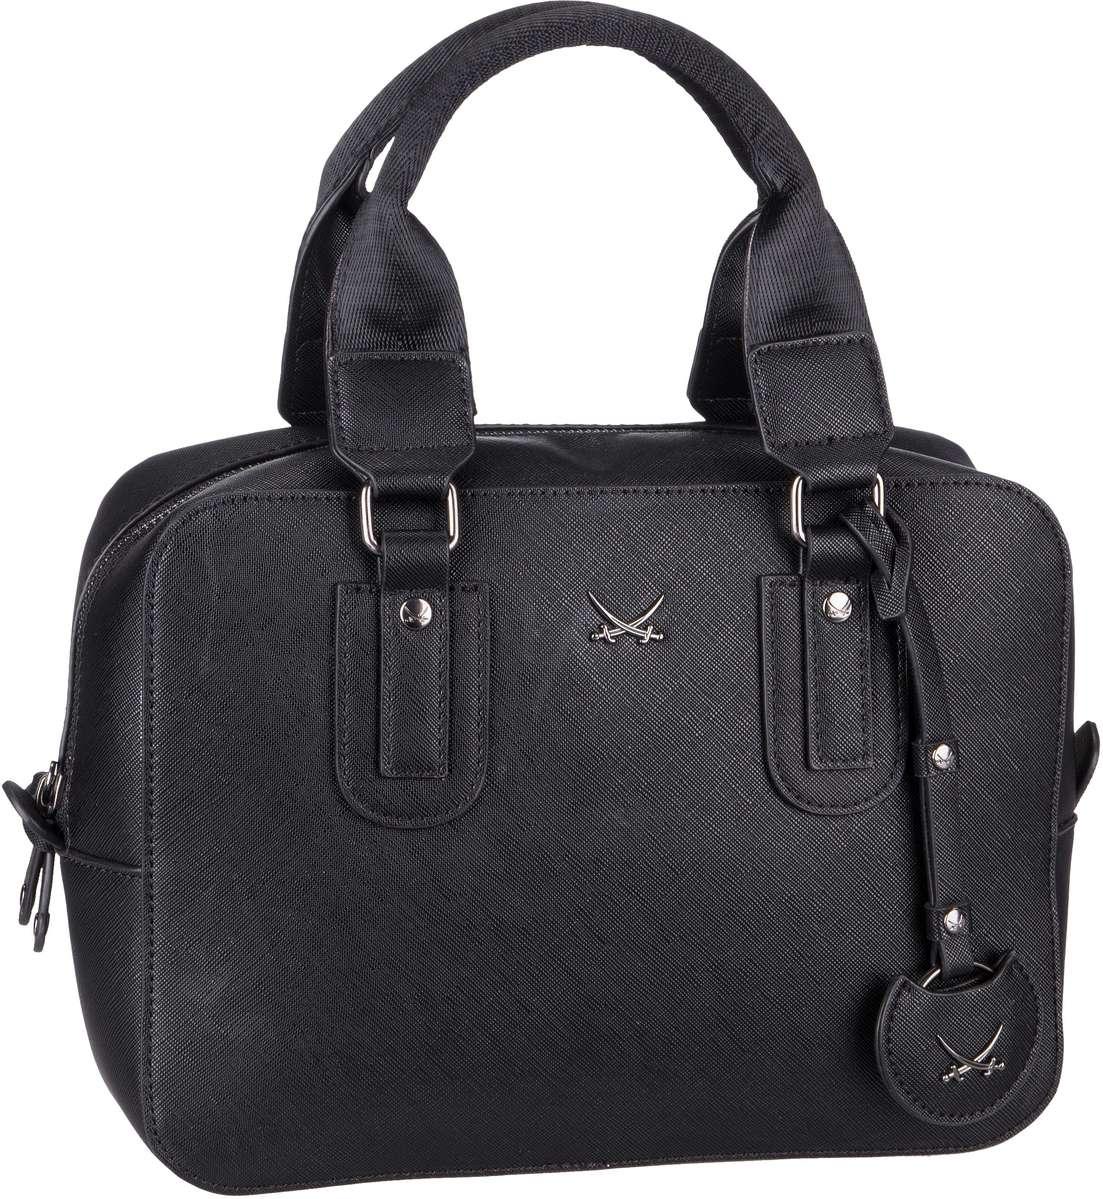 Handtasche Bowling Bag 1331 Black